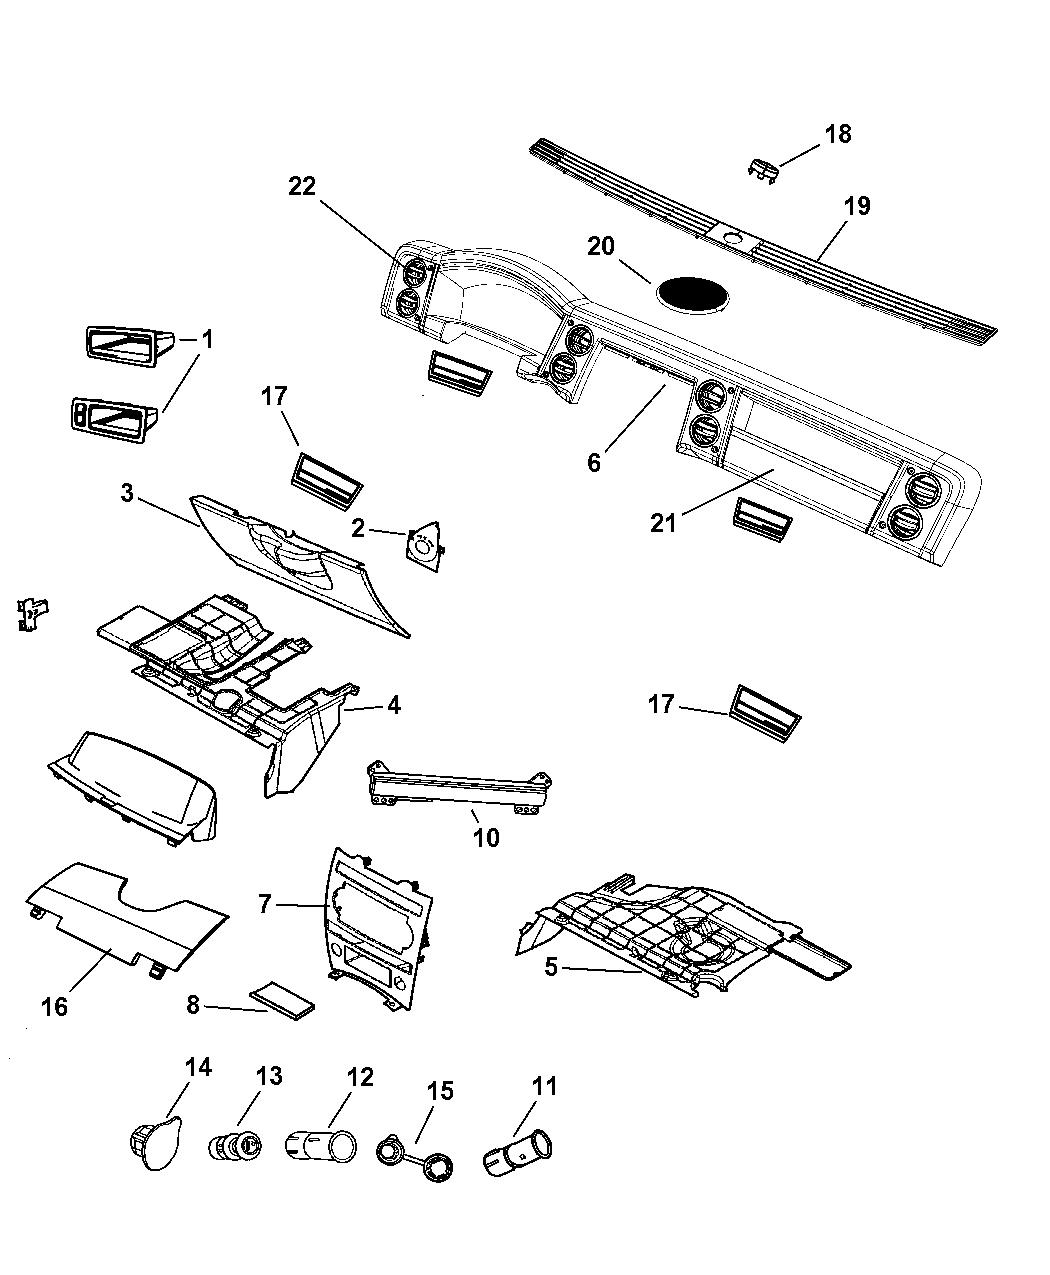 5jn32zj8ad Genuine Jeep Plug Instrument Panel